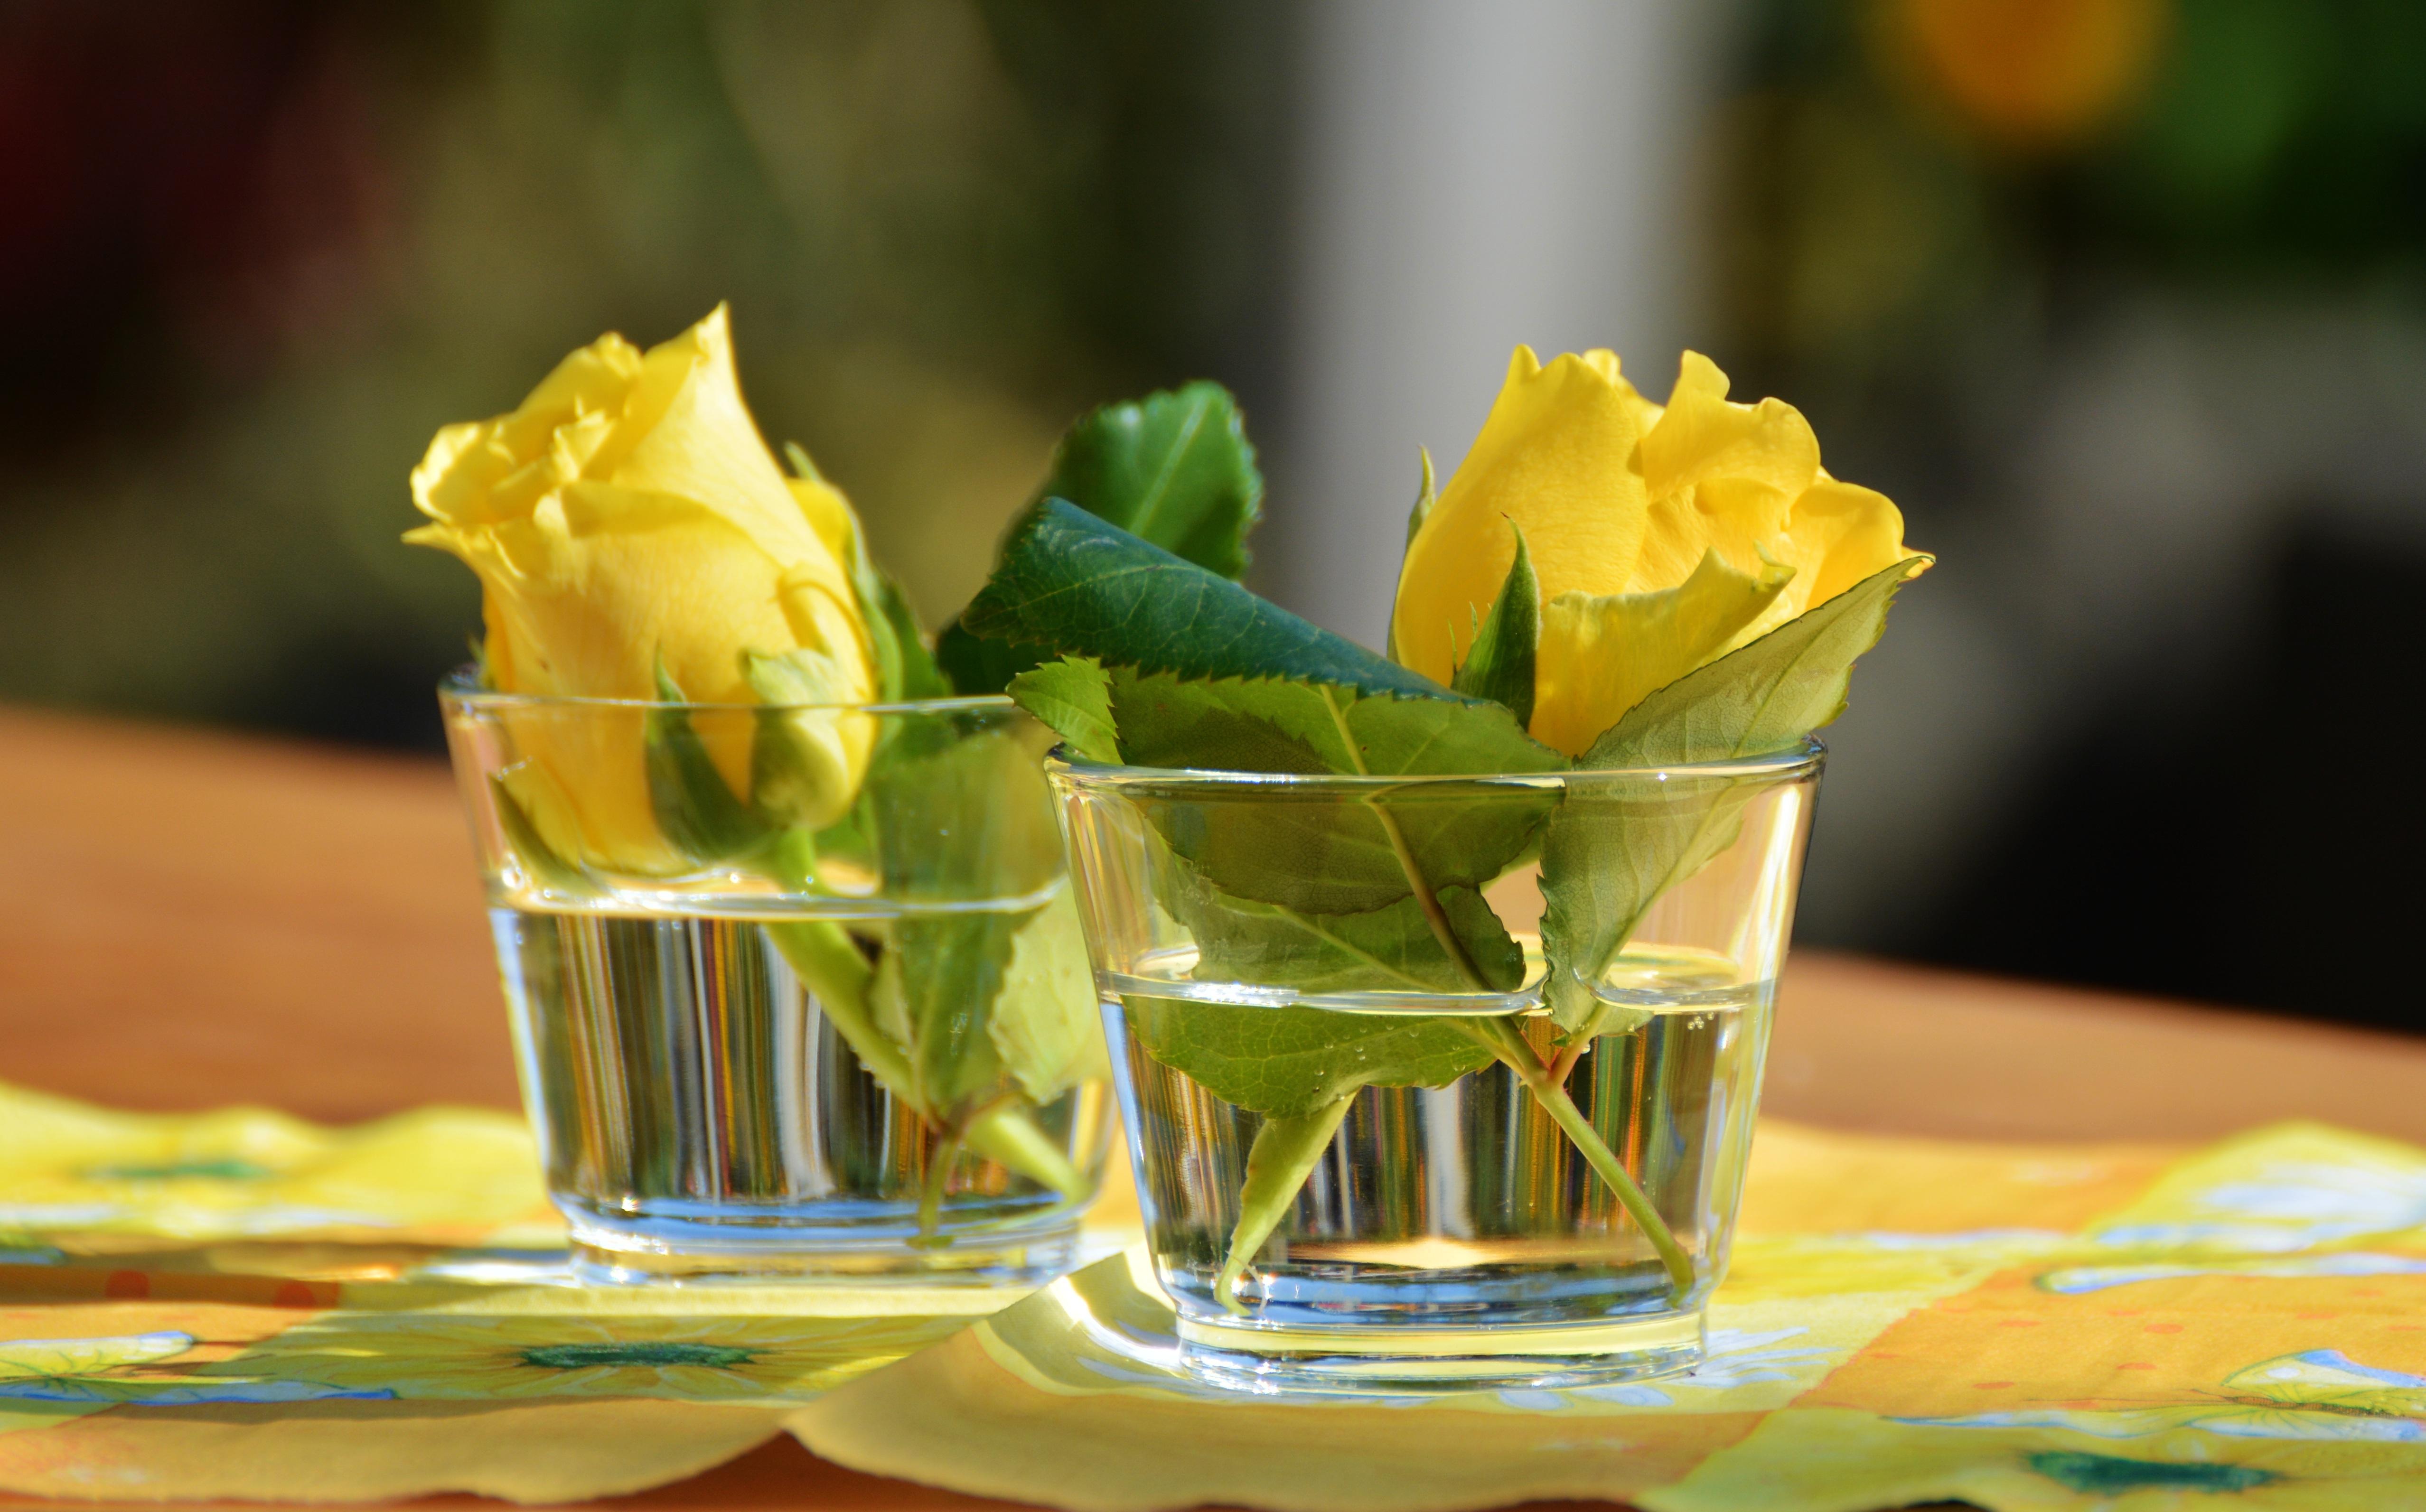 Kostenlose Foto Blatt Blume Feier Vase Dekoration